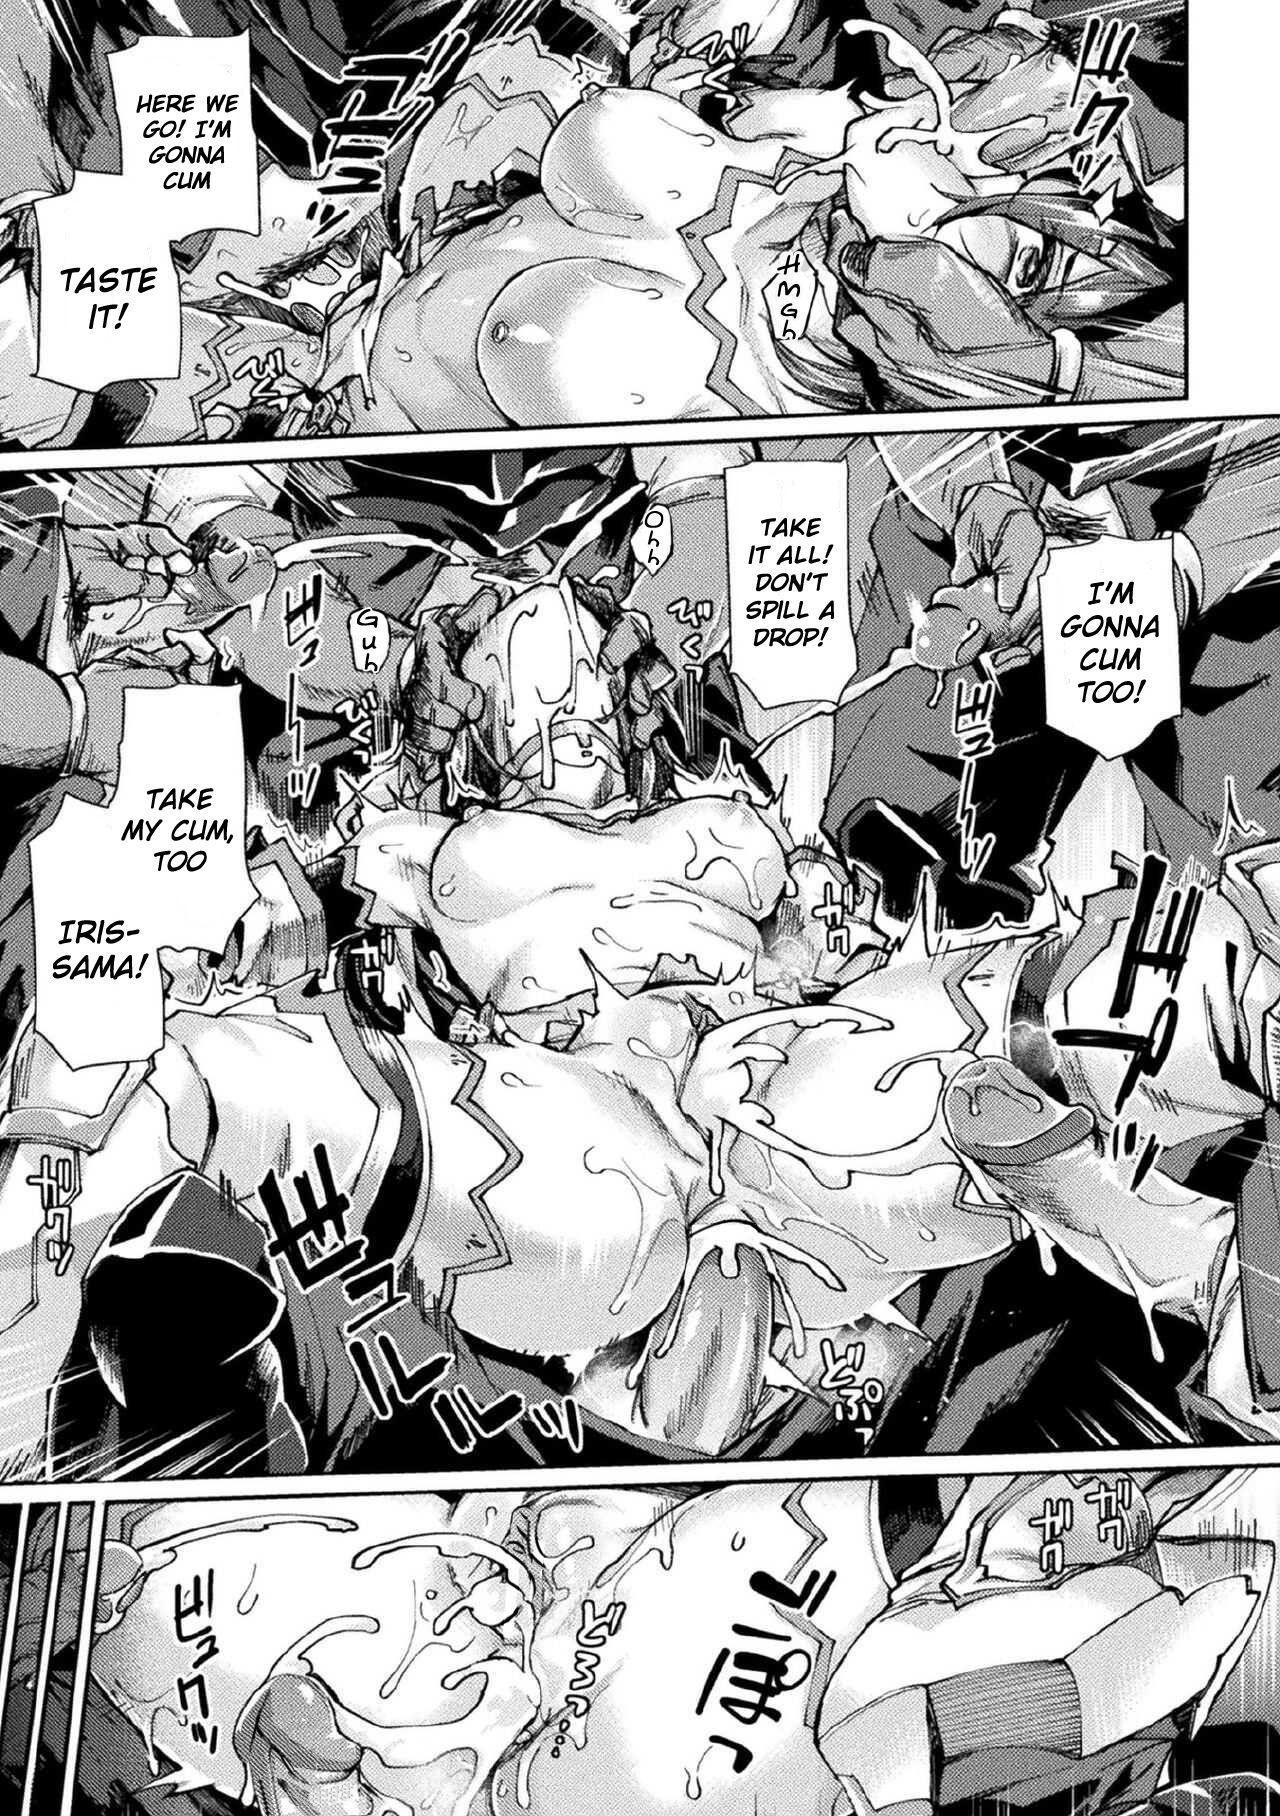 [Tsukitokage] Kuroinu II ~Inyoku ni Somaru Haitoku no Miyako, Futatabi~ THE COMIC Chapter 7 (Kukkoro Heroines Vol. 9) [English] [Decensored] (Klub Kemoner) [Digital] 20